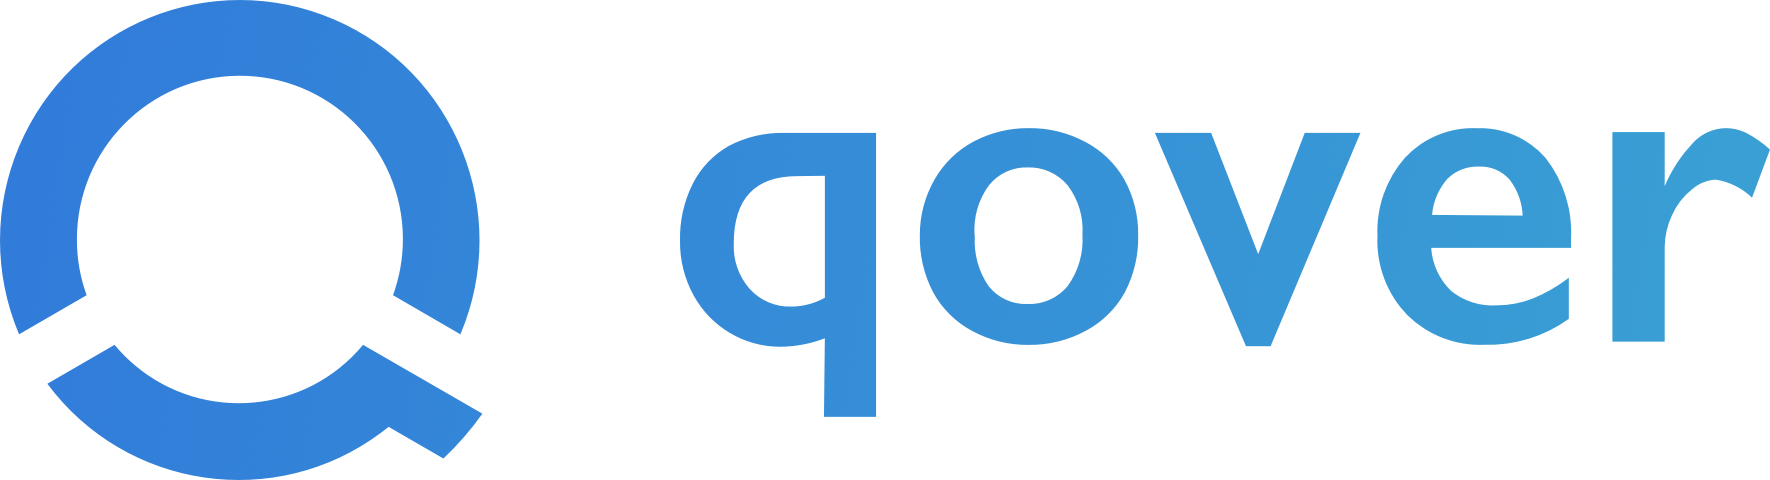 Qover logo